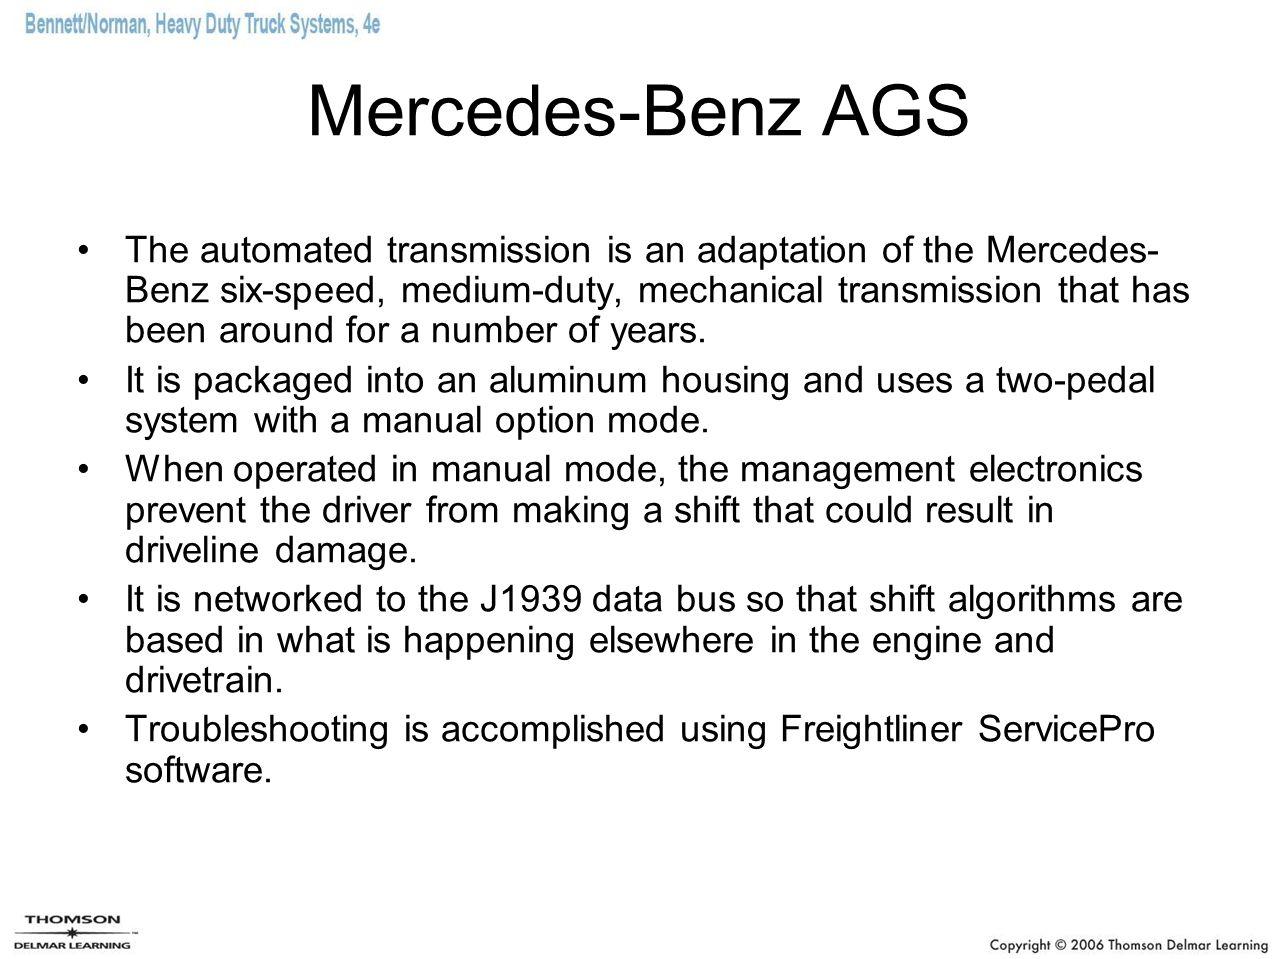 Mercedes-Benz AGS